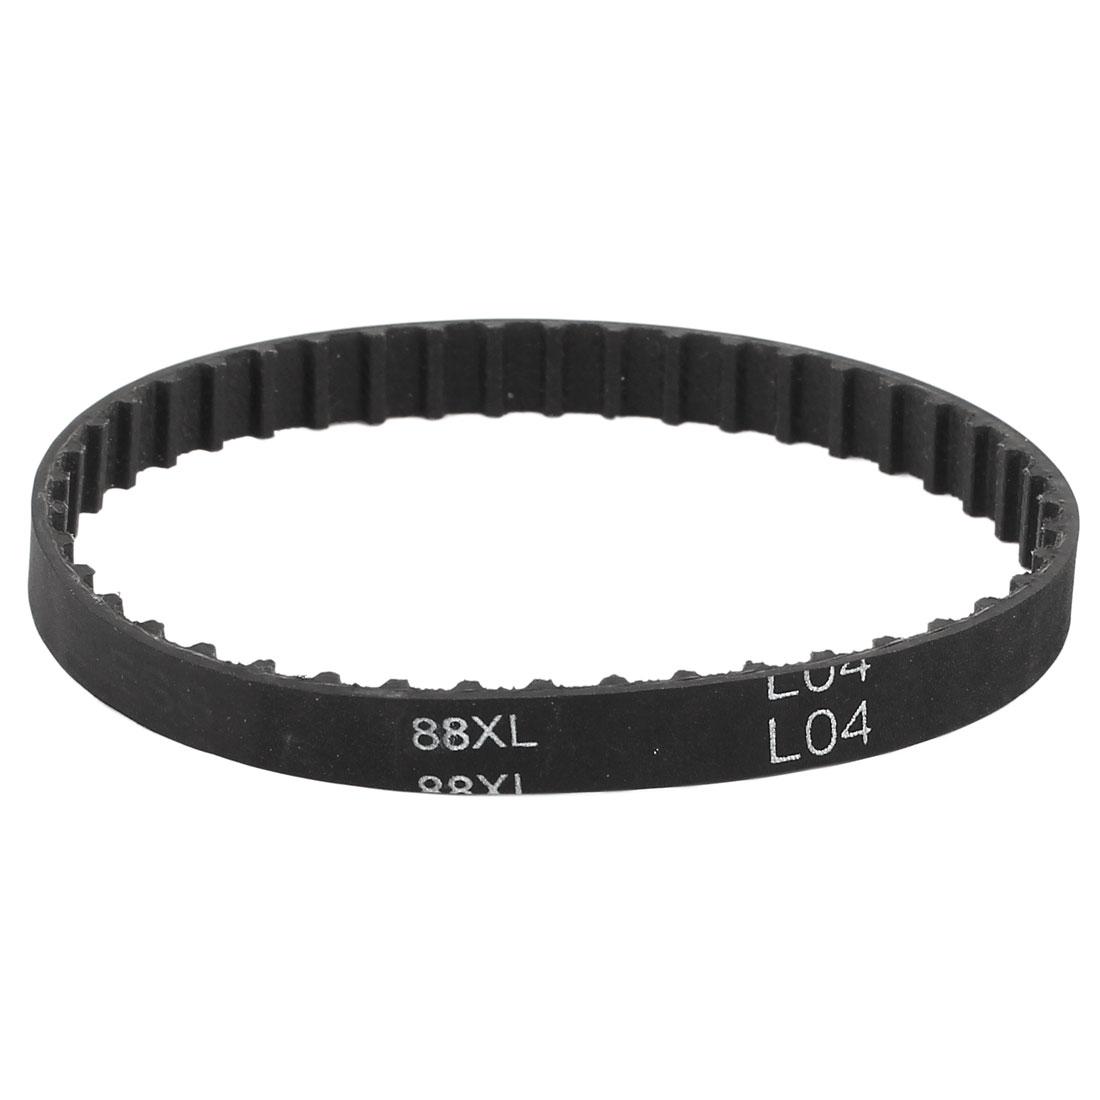 88XL 031 44 Teeth 7.9mm Width Rubber Drying Machine Timing Belt Black